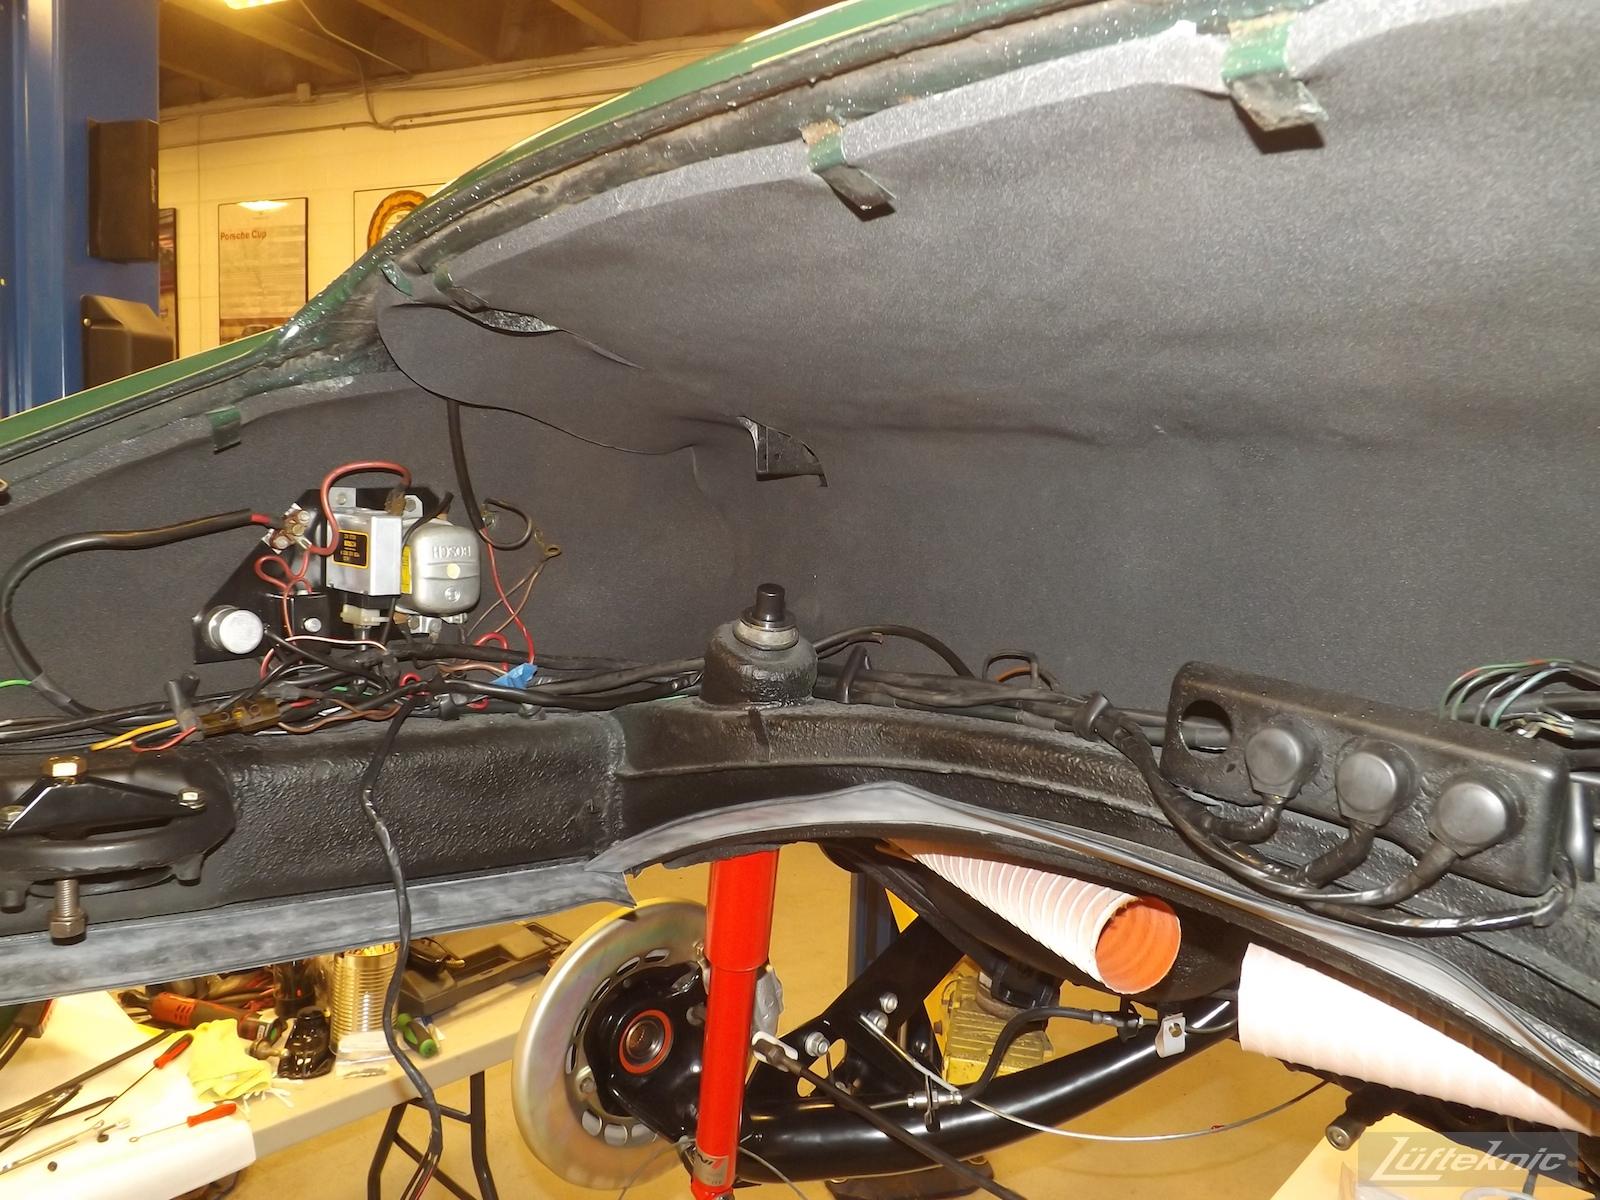 Engine bay reassembly on an Irish Green Porsche 912 undergoing restoration at Lufteknic.